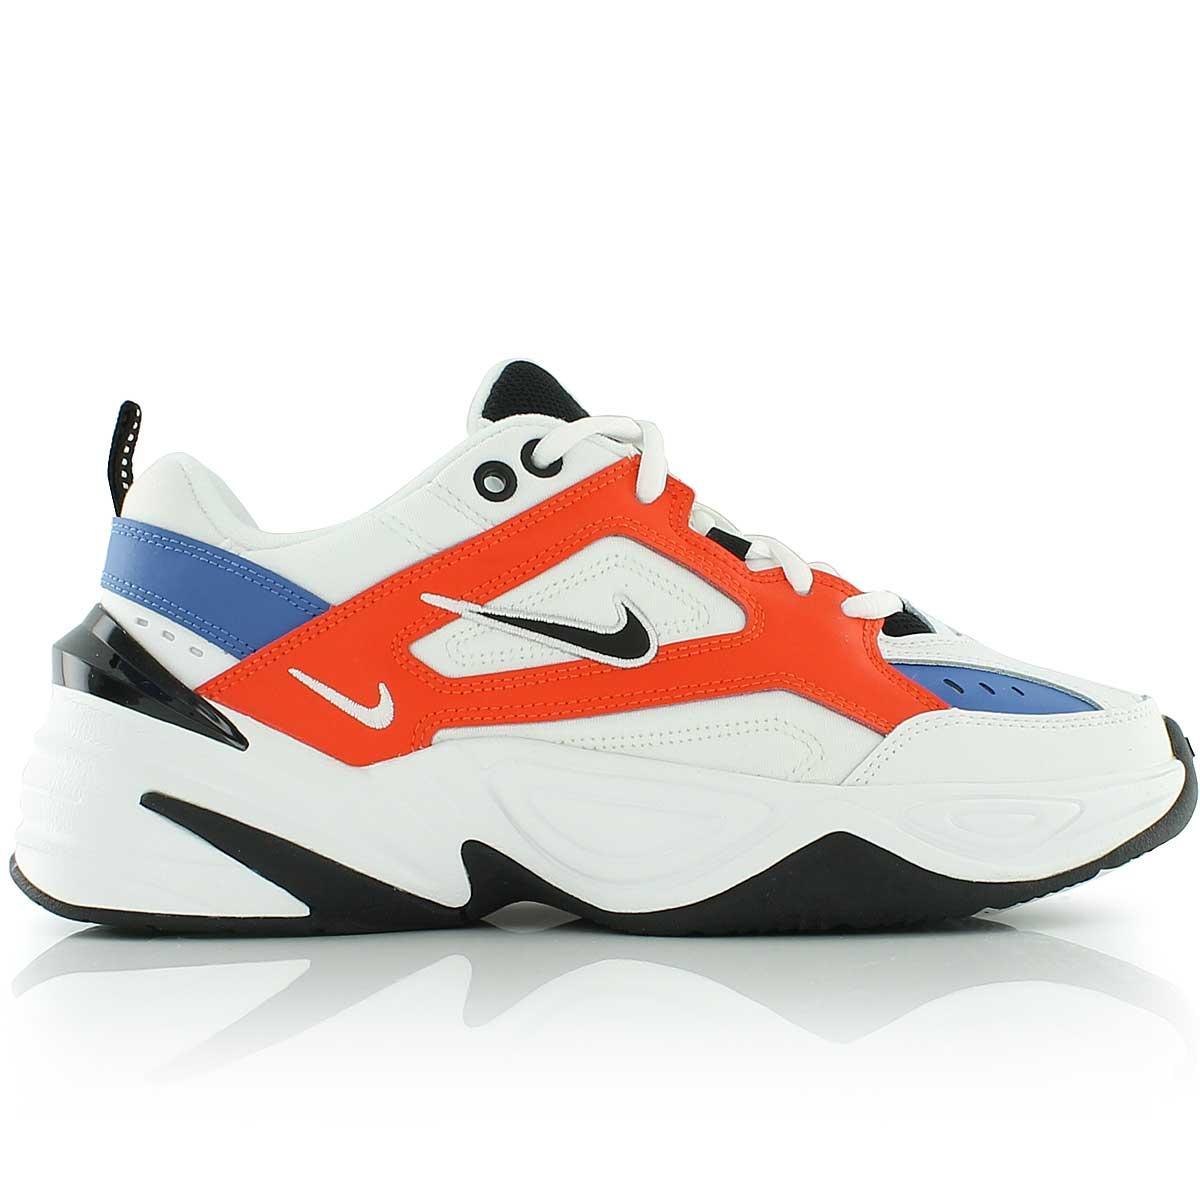 Вьетнам / Кроссовки Nike M2K Tekno White/Red/Blue